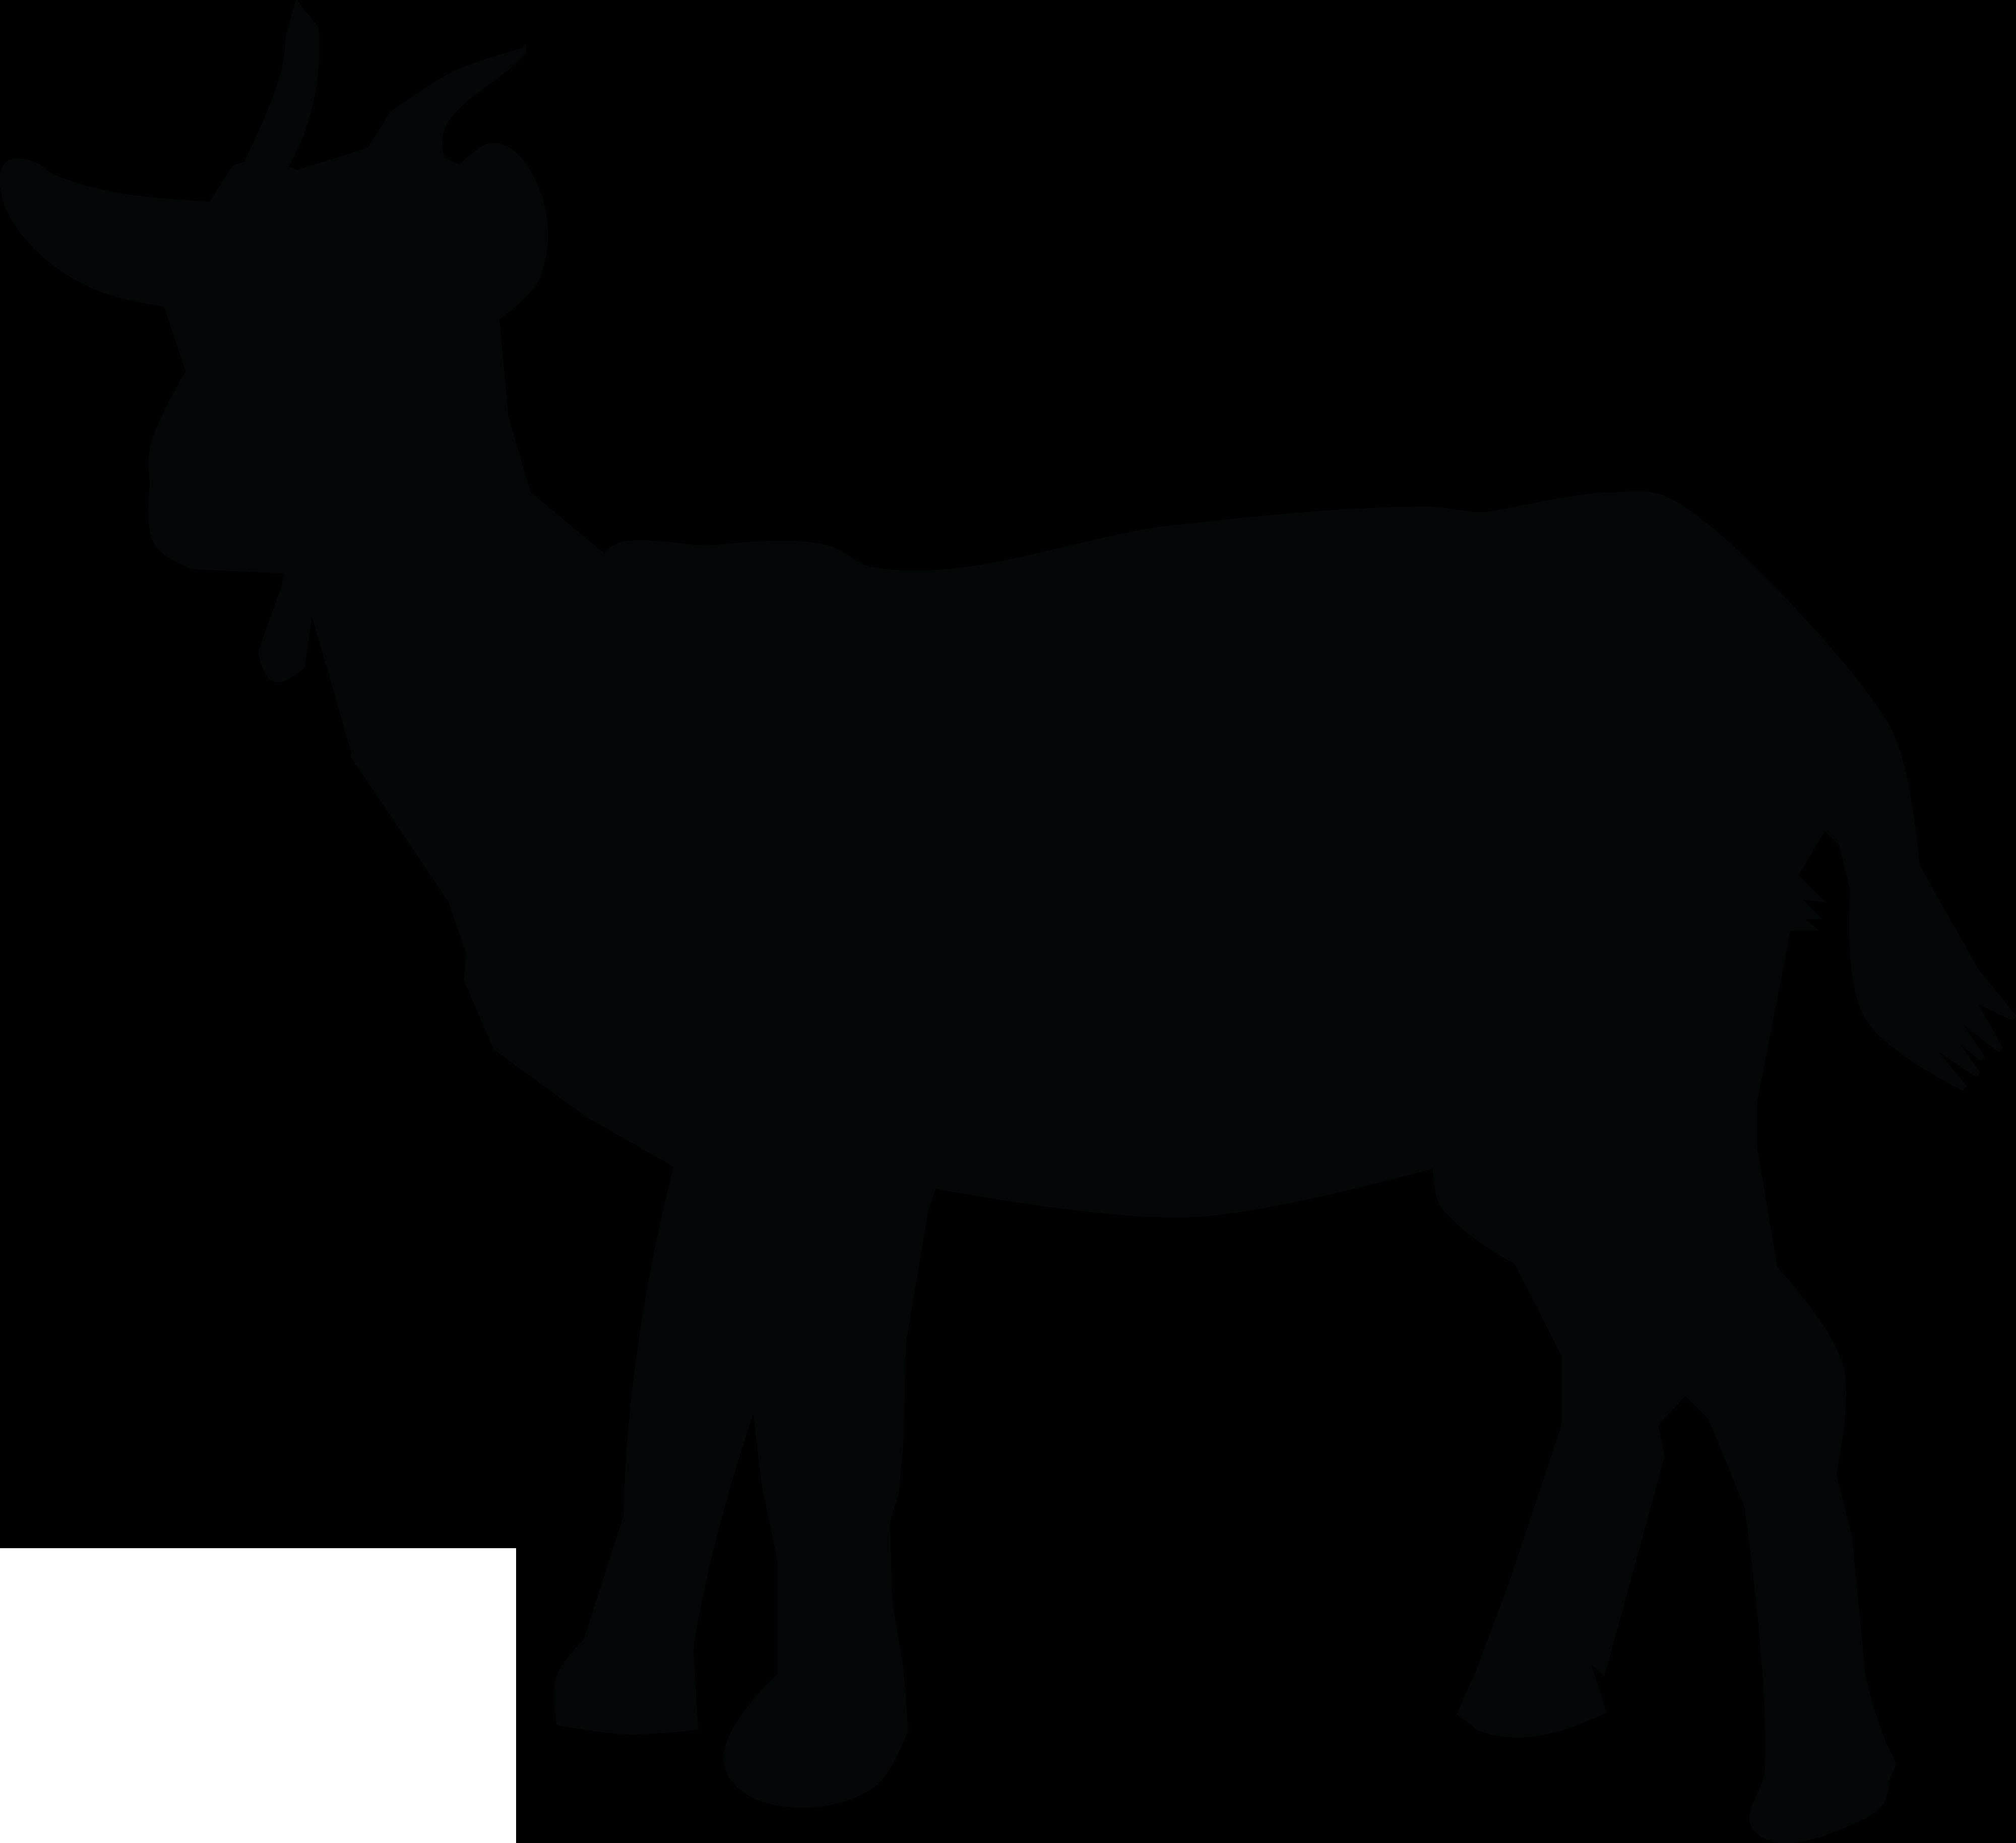 4000x3657 Black And White Goat Clipart